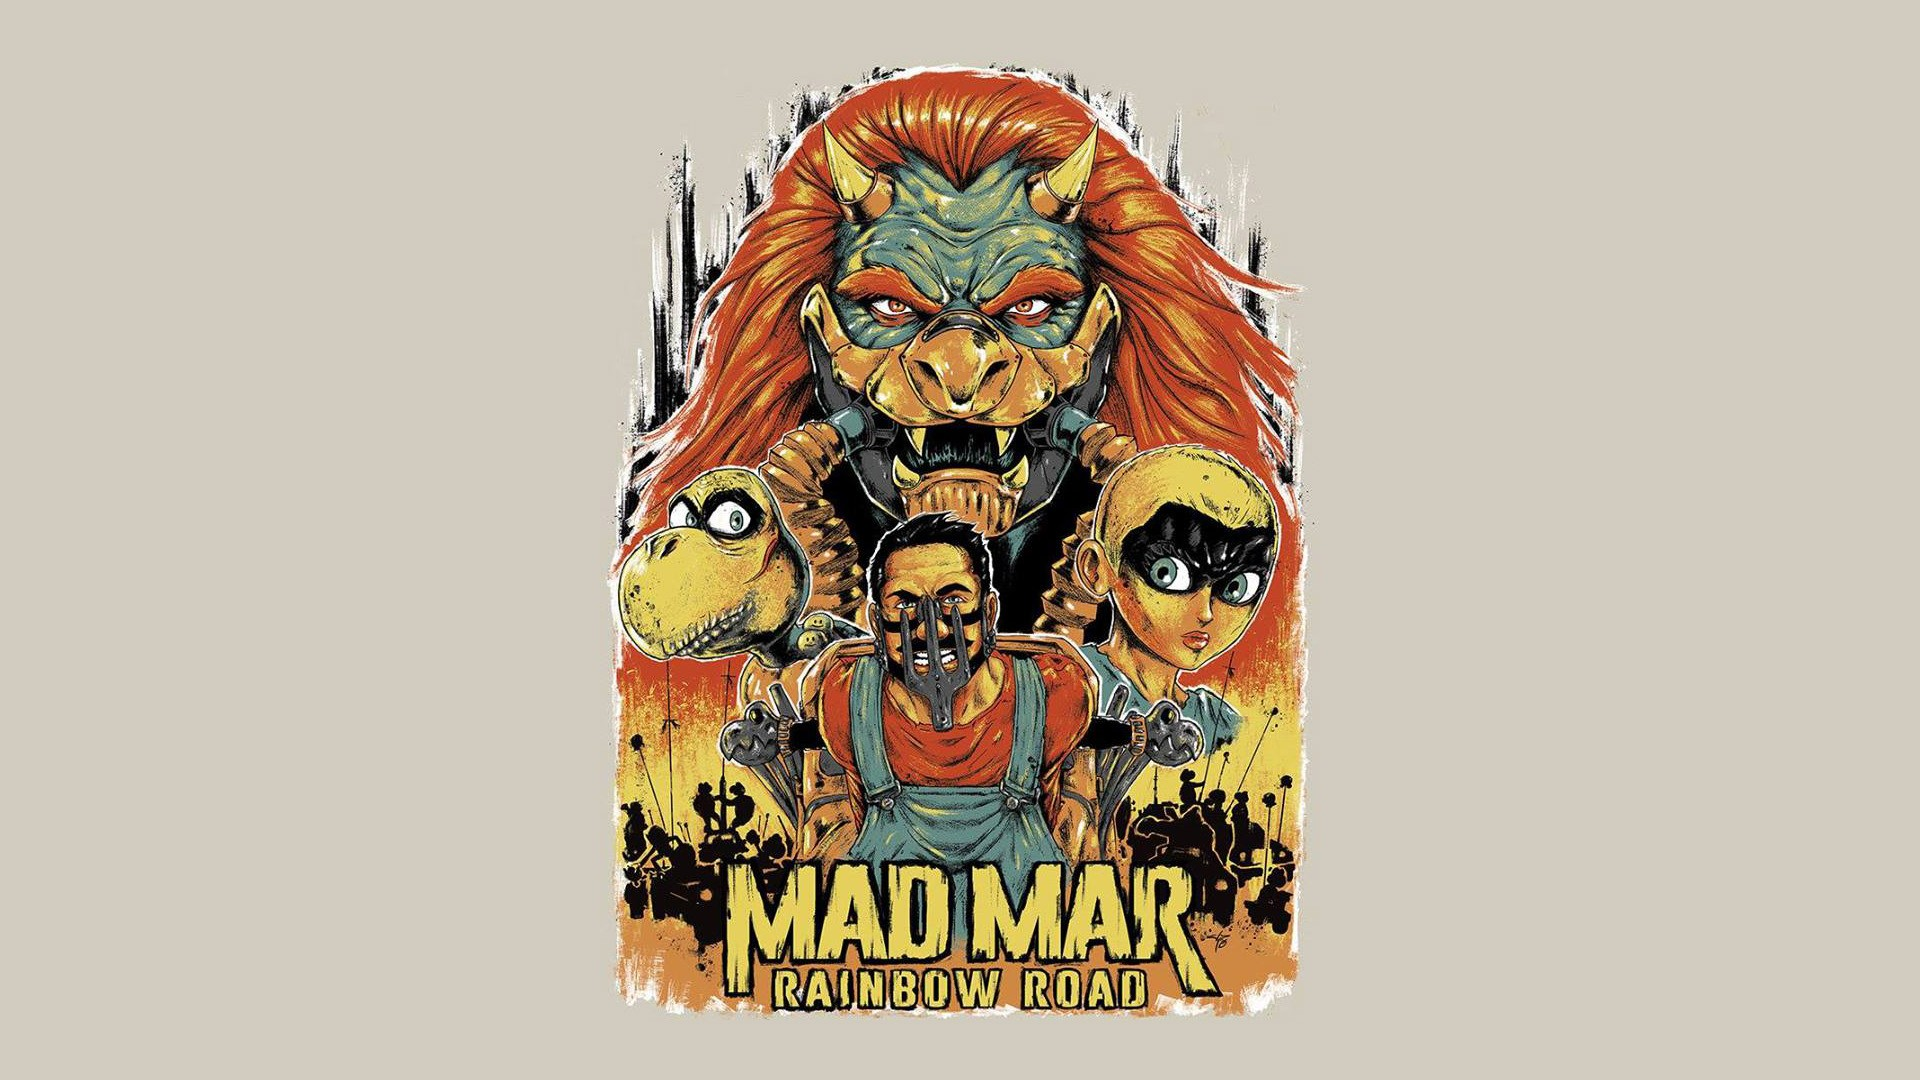 Mario Kart Mad Max Rainbow Road Wallpaper Hd Games 4k